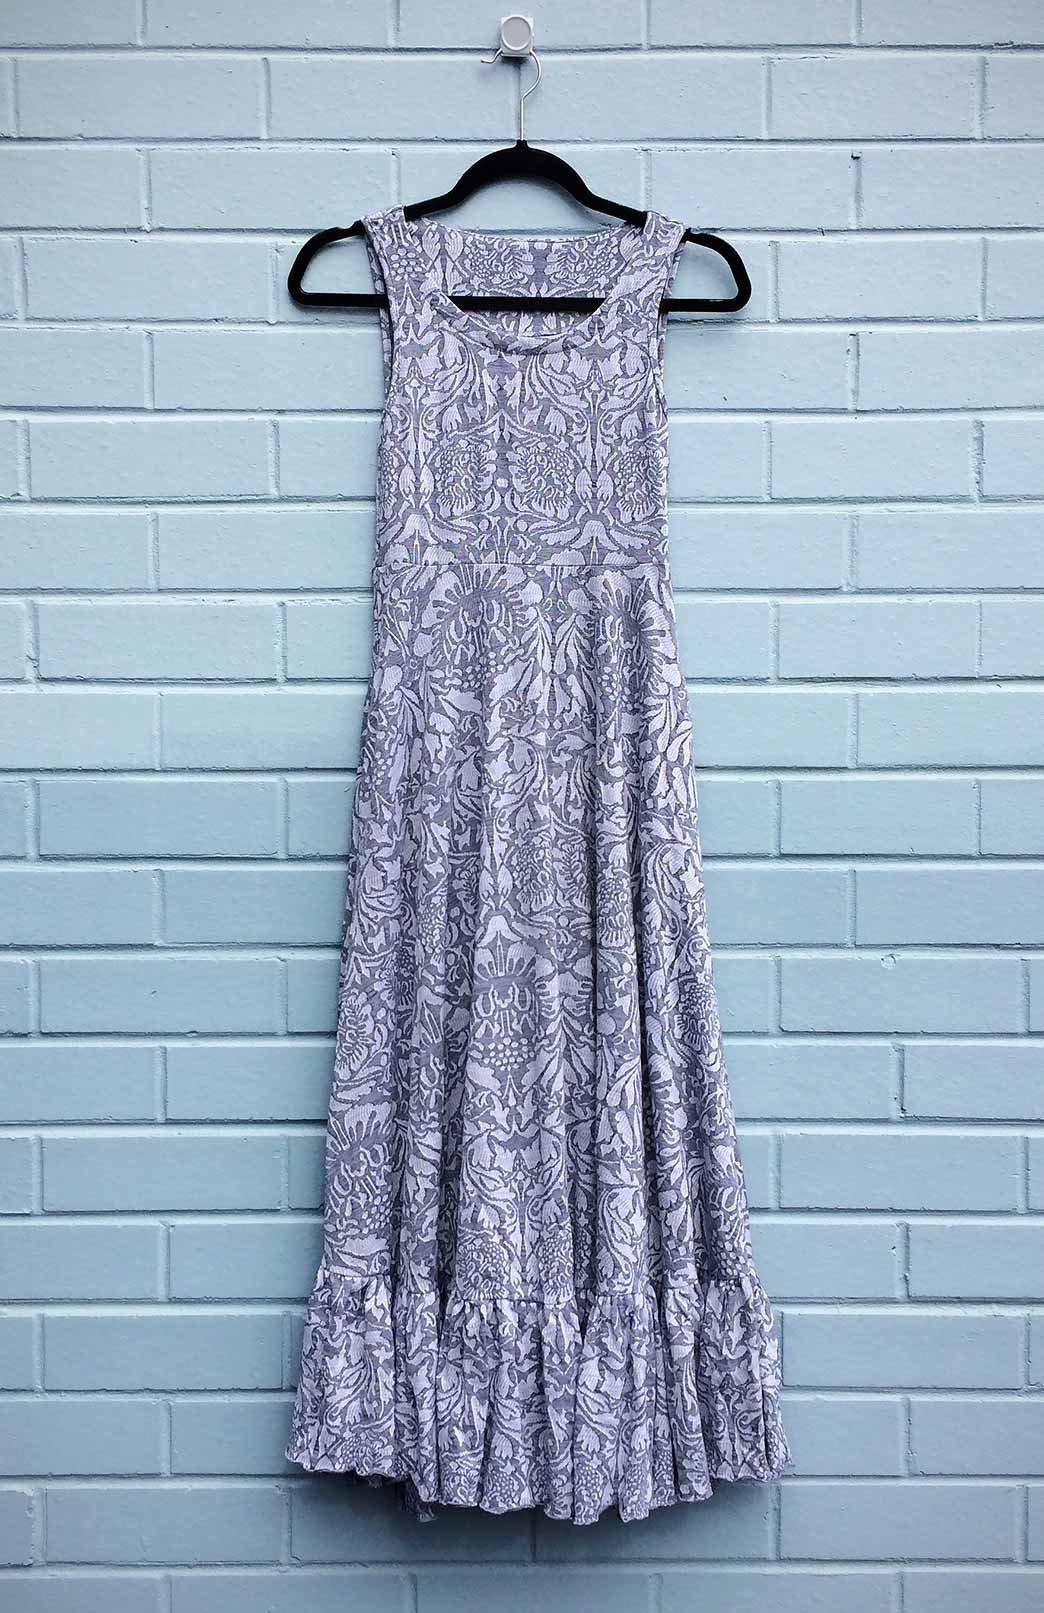 Fleur Maxi Dress - Women's Abbey Floral Patterned Merino Wool Sleeveless Summer Maxi Dress - Smitten Merino Tasmania Australia